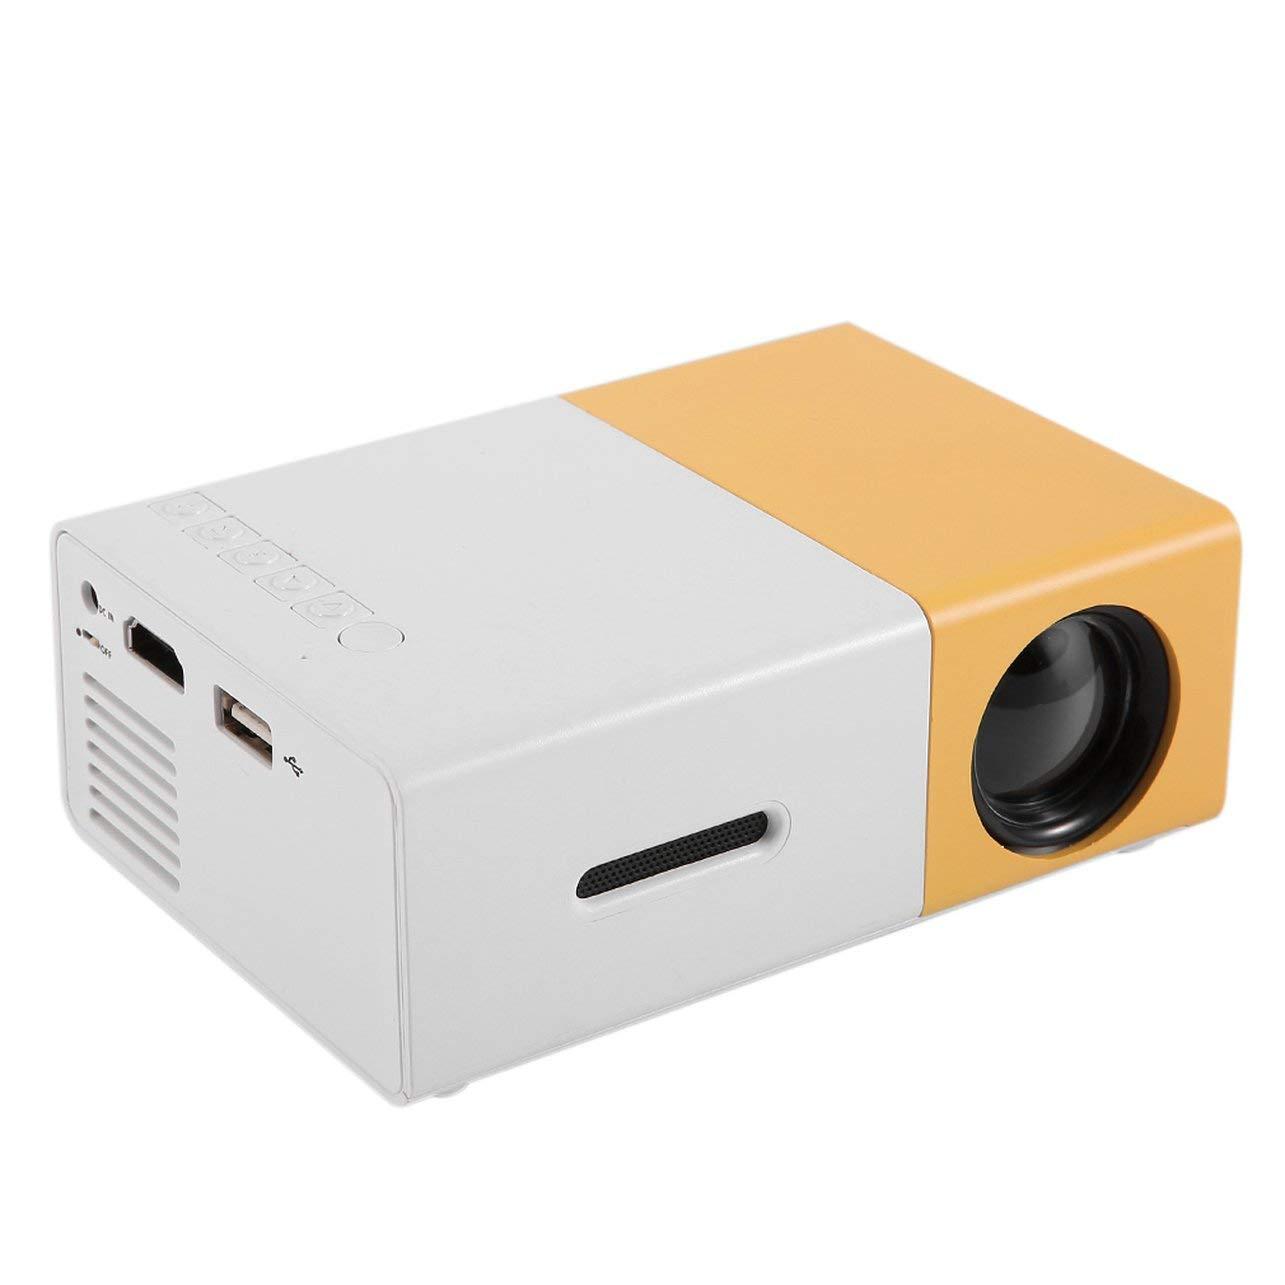 WOSOSYEYO YG300 Profesional Mini proyector de Cine en casa HD1080P ...